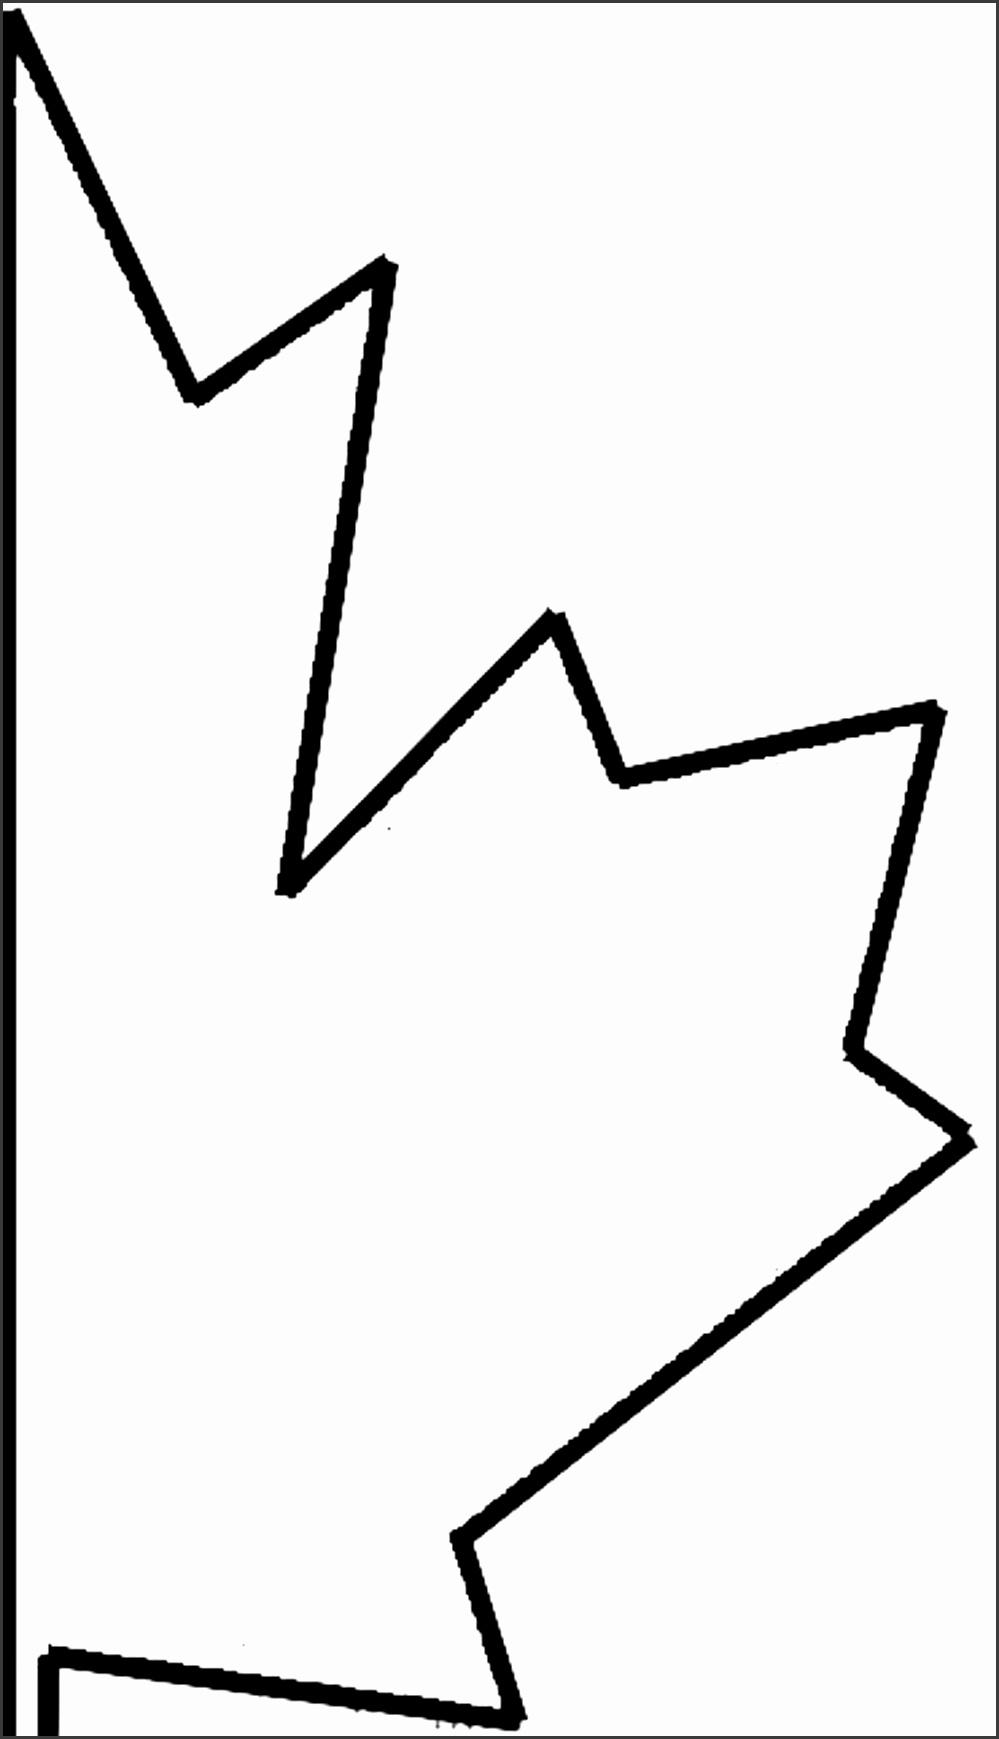 pattern for maple leaf image